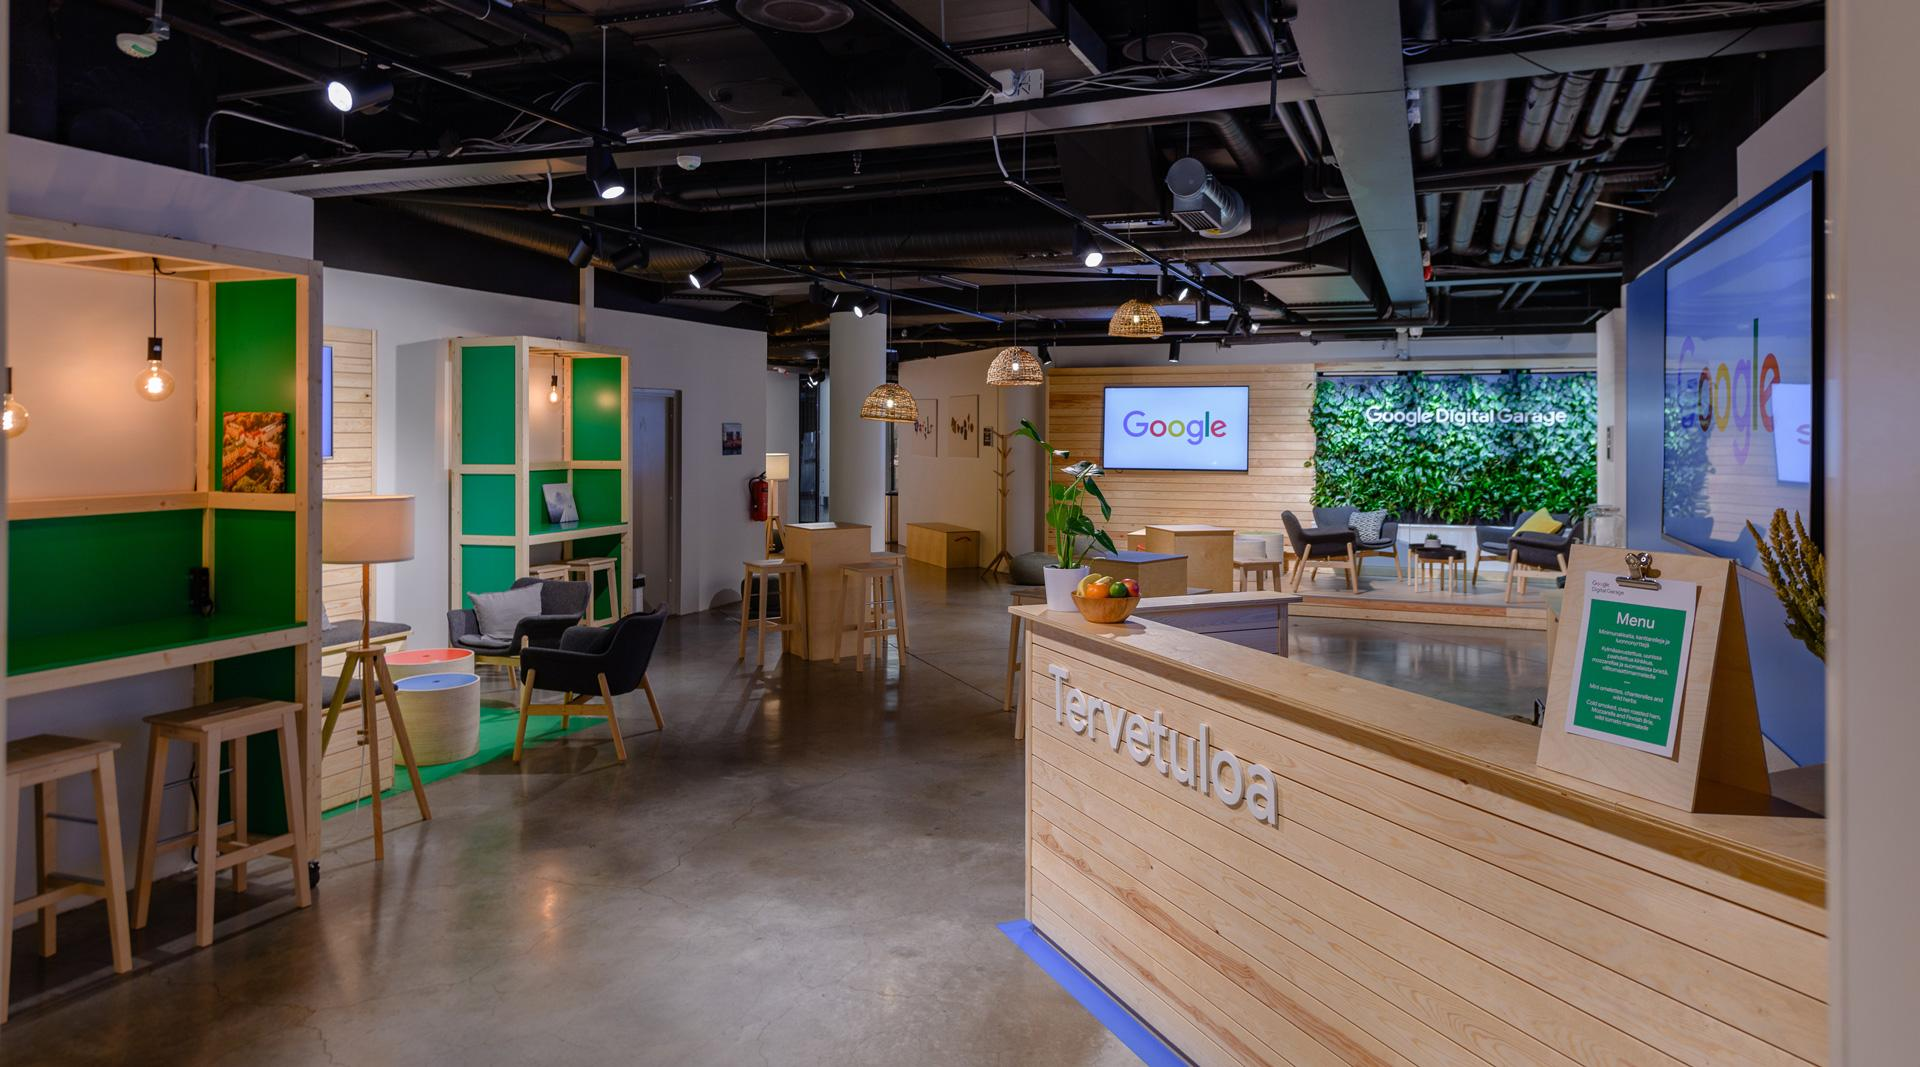 Google Digital Garage Oppimistila Helsingin Kluuvikadulla